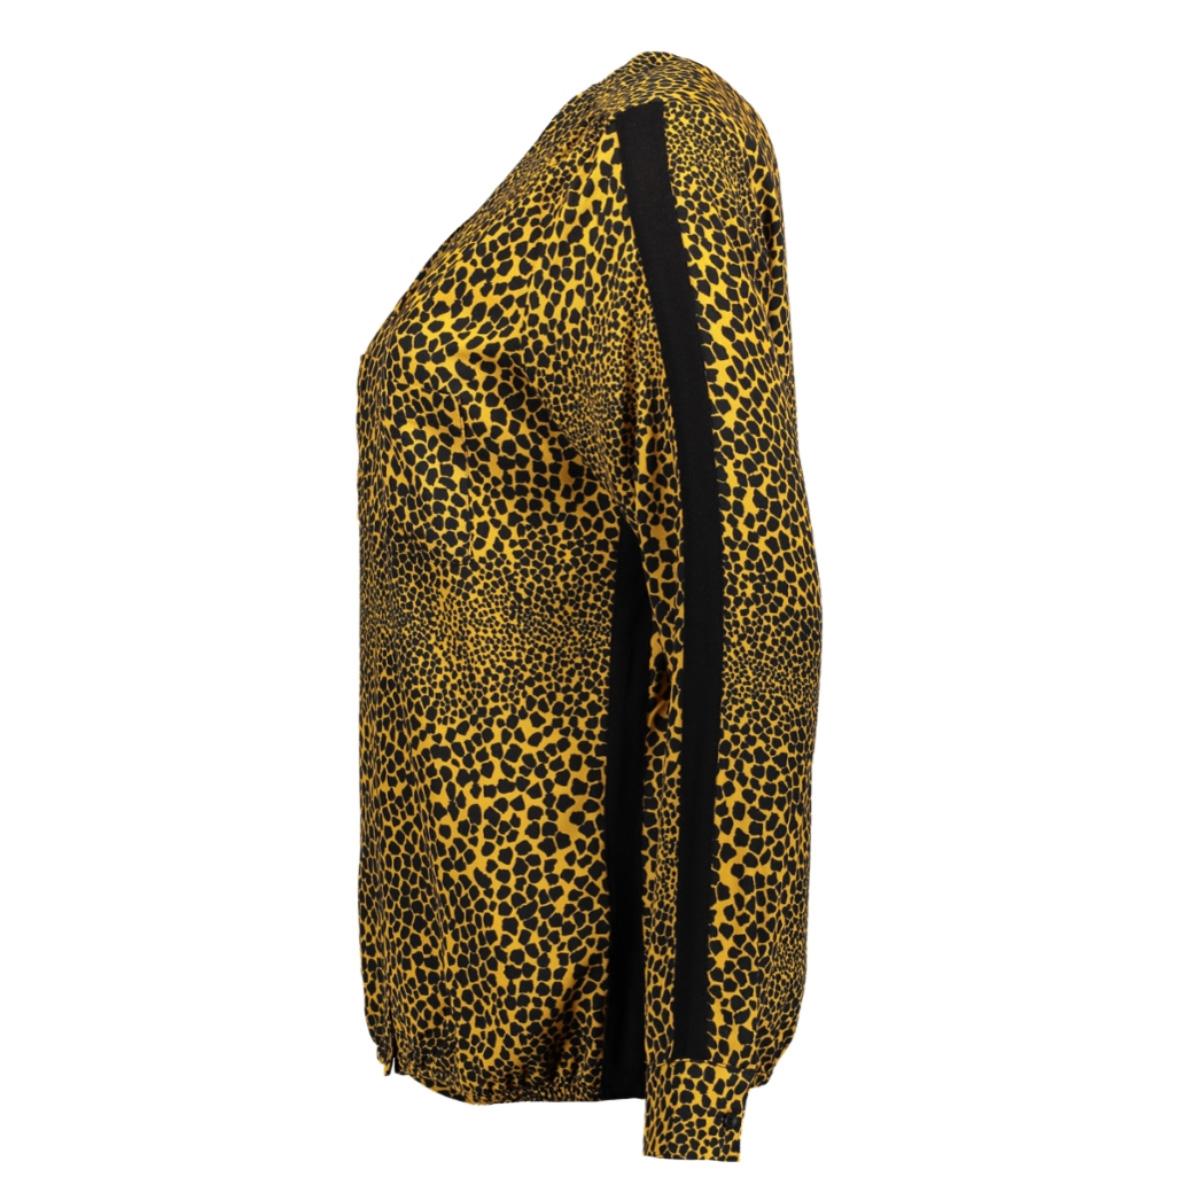 elin allover printed blouse 195 zoso blouse goldyellow/black